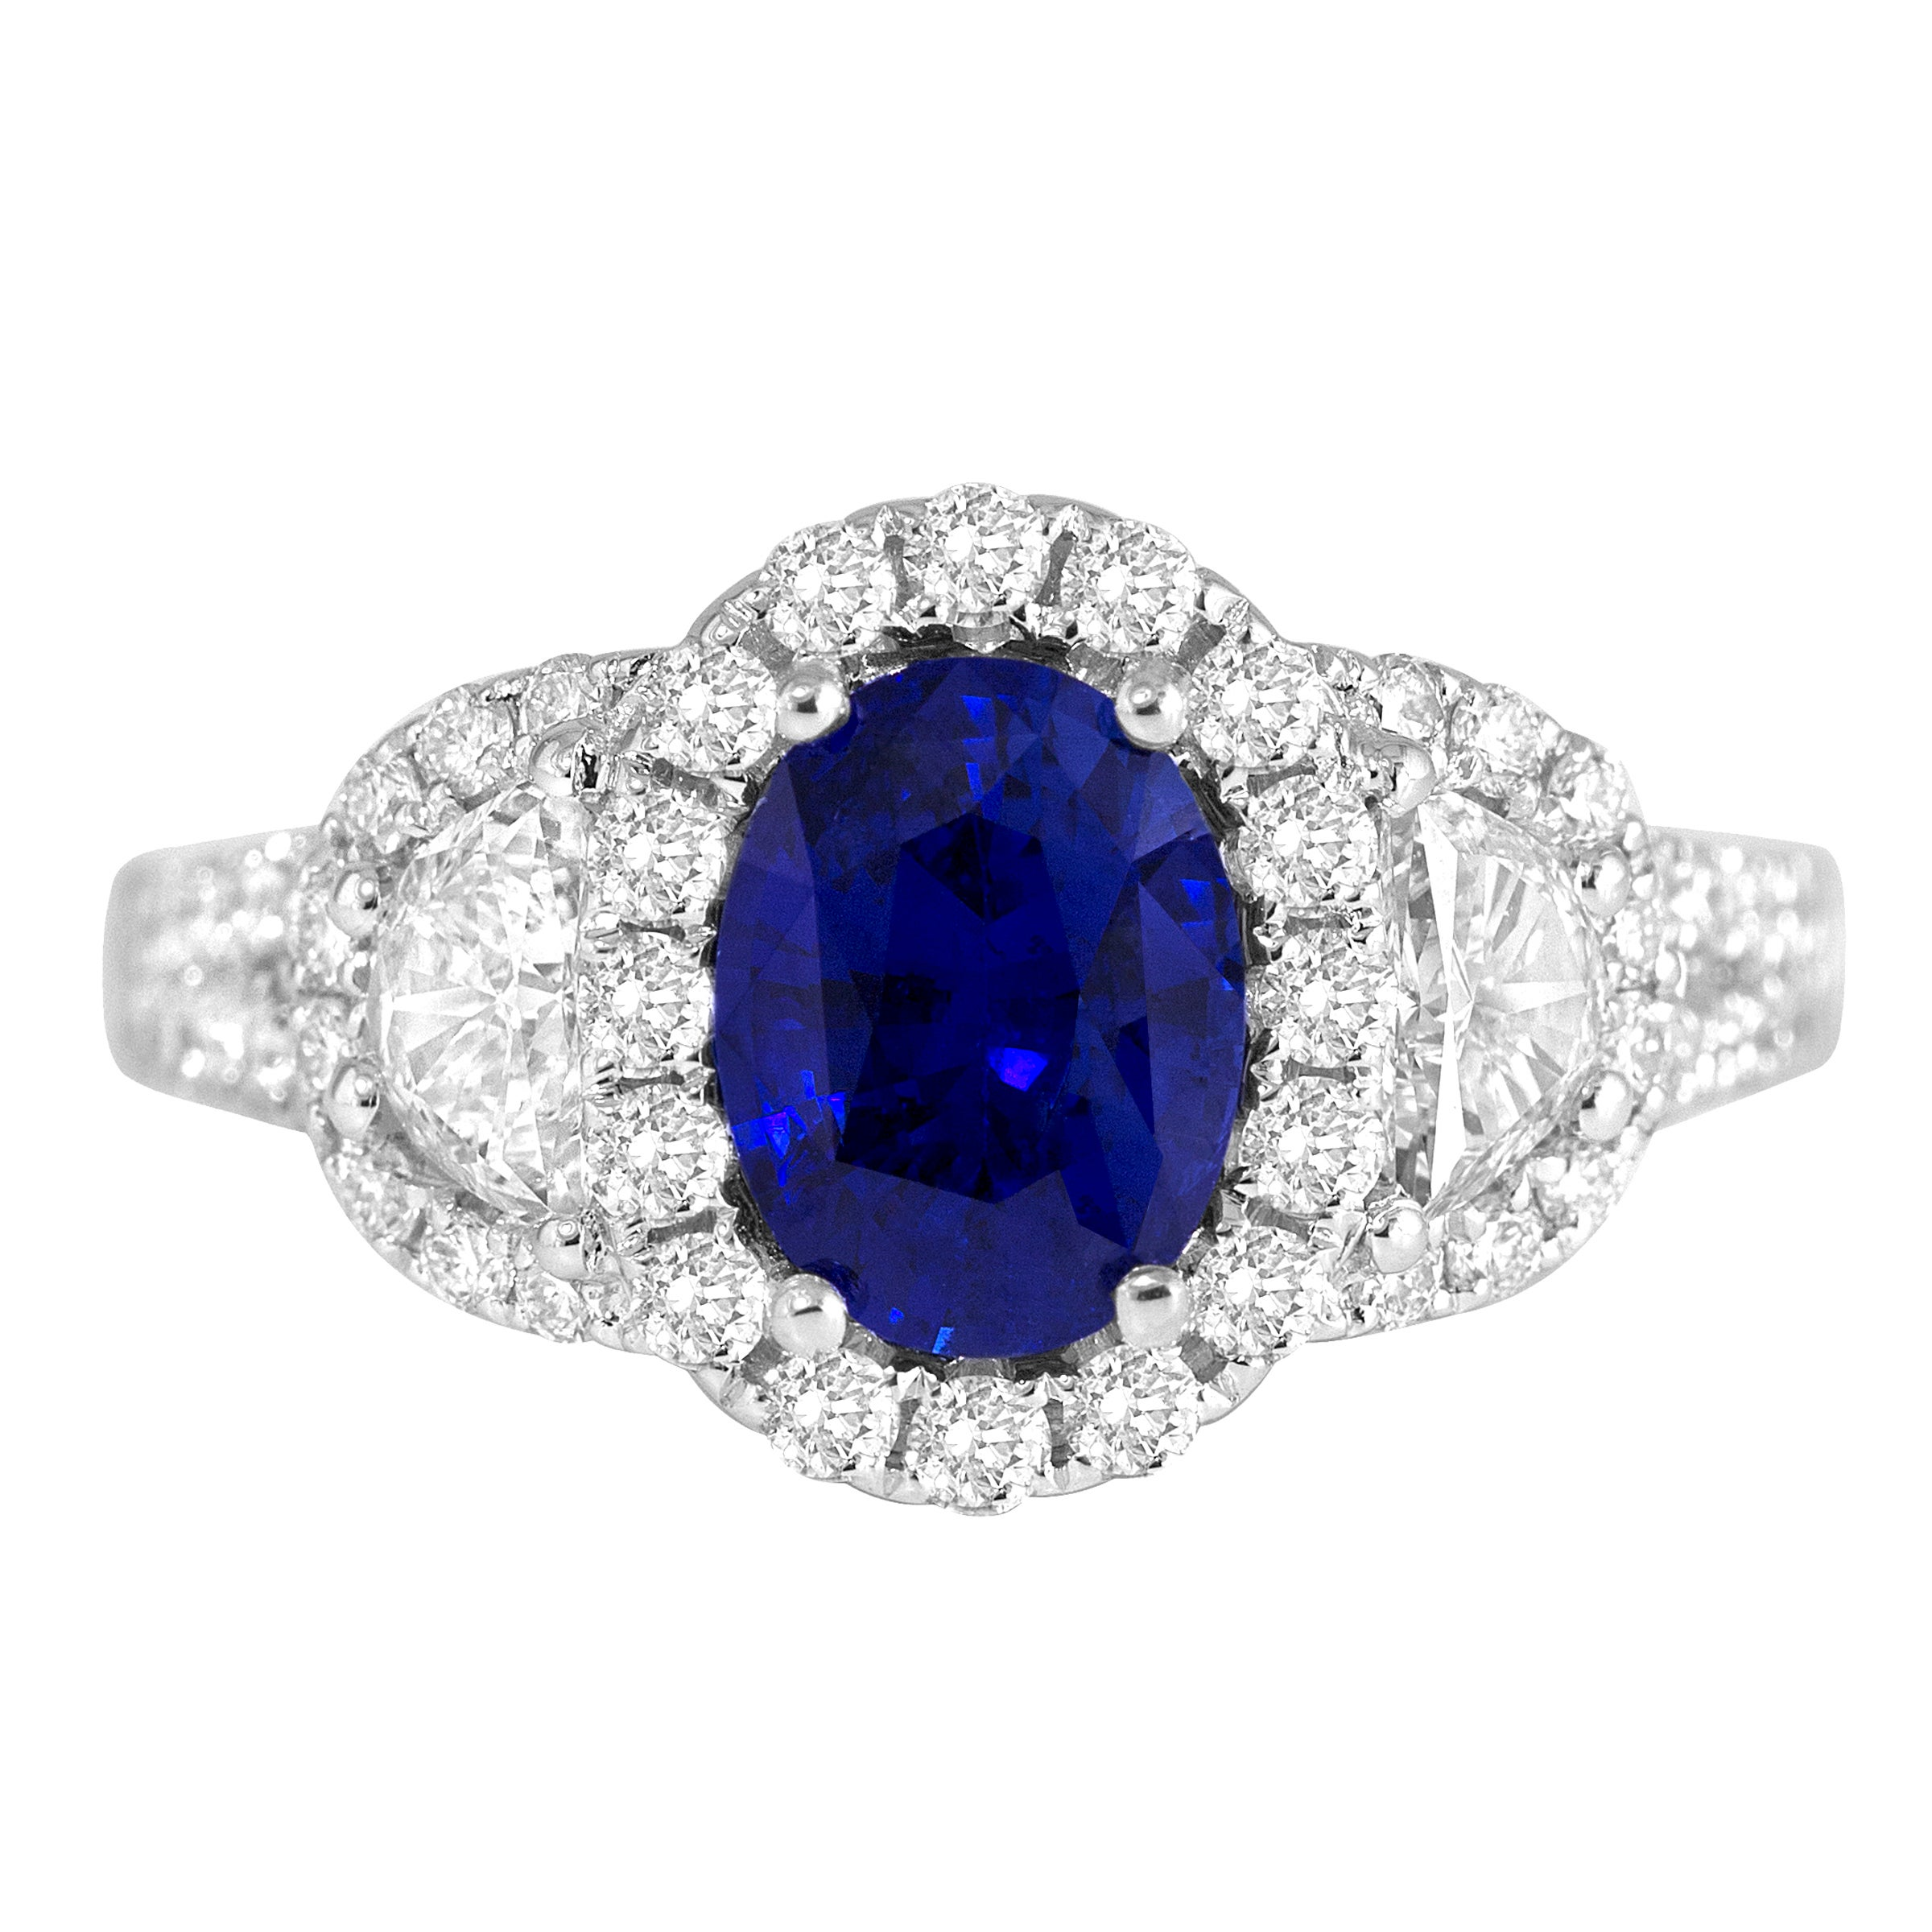 DiamondTown 2.26 Carat Oval Cut Fine Ceylon Sapphire Ring